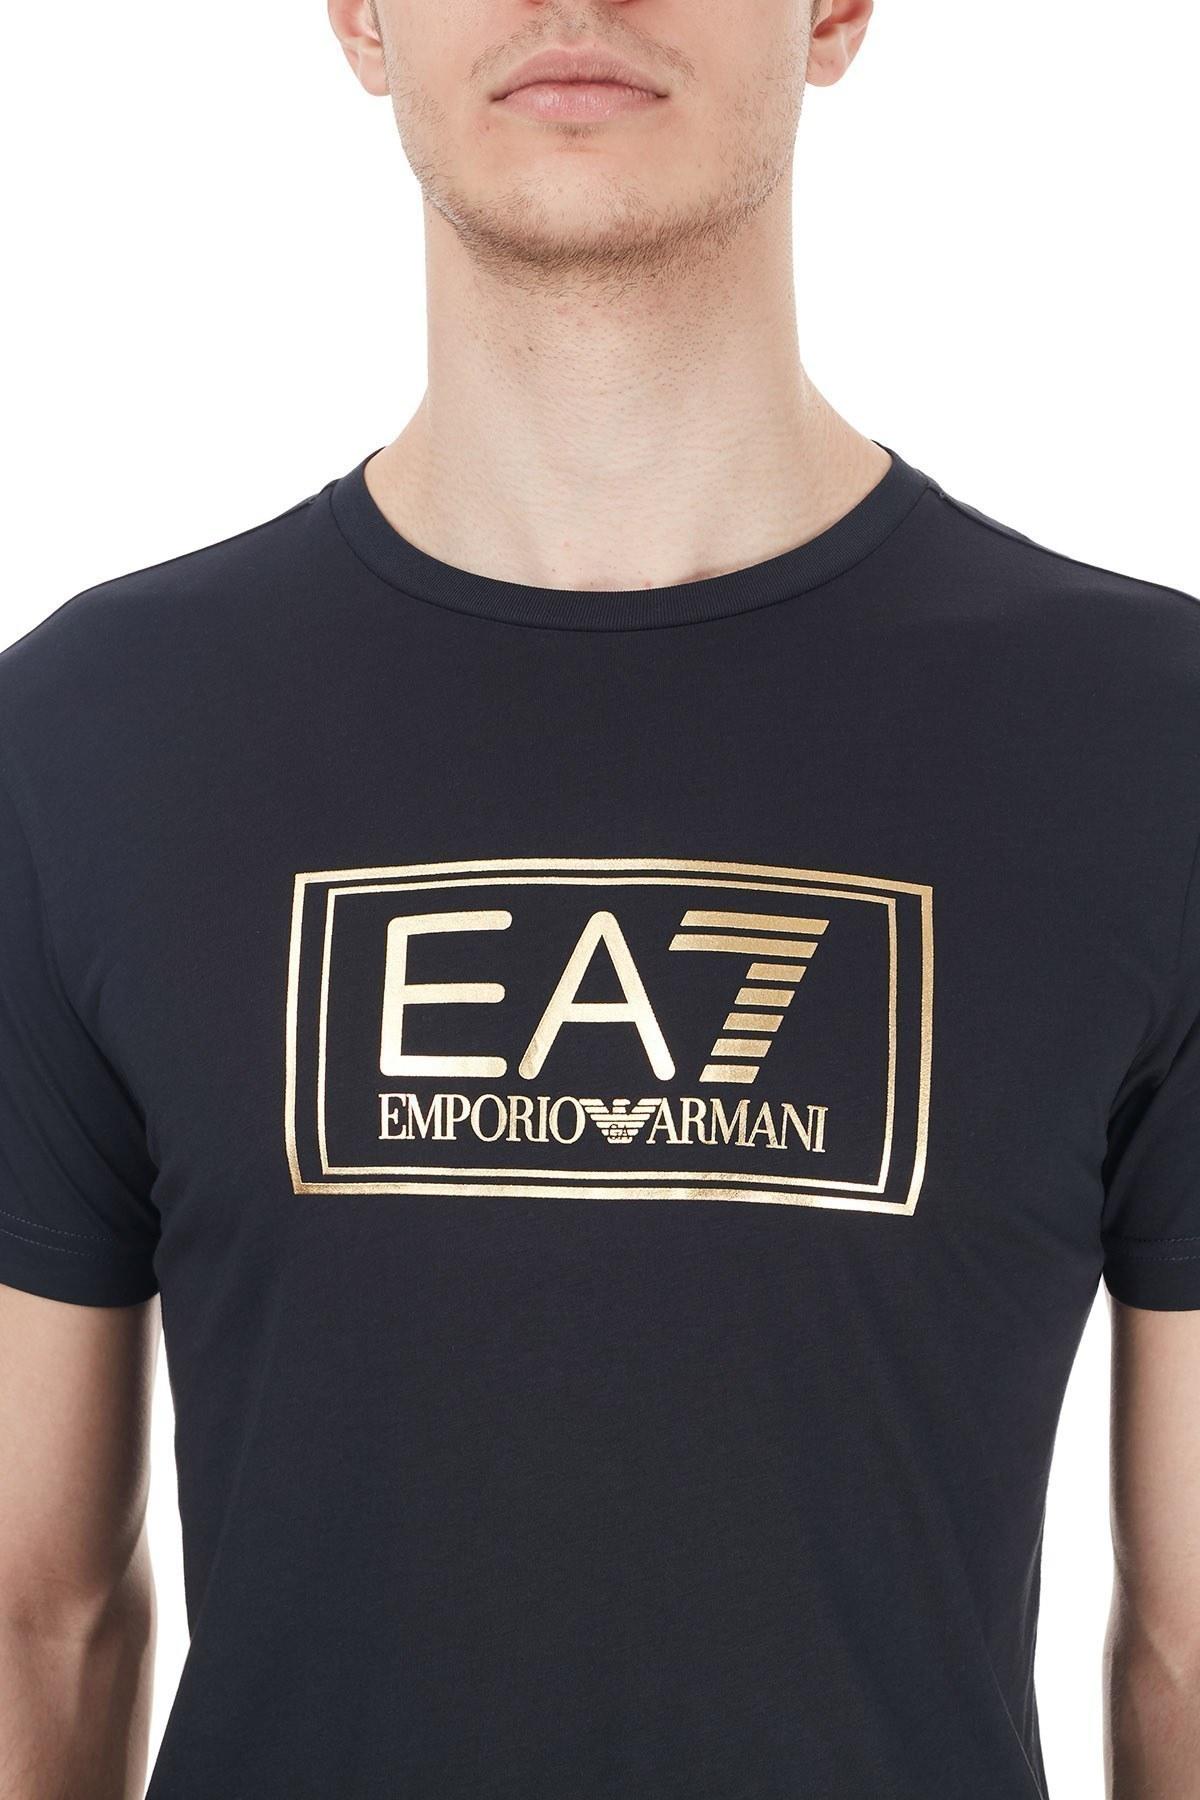 EA7 Baskılı Bisiklet Yaka % 100 Pamuk Erkek T Shirt 6HPT51 PJM9Z 1578 LACİVERT